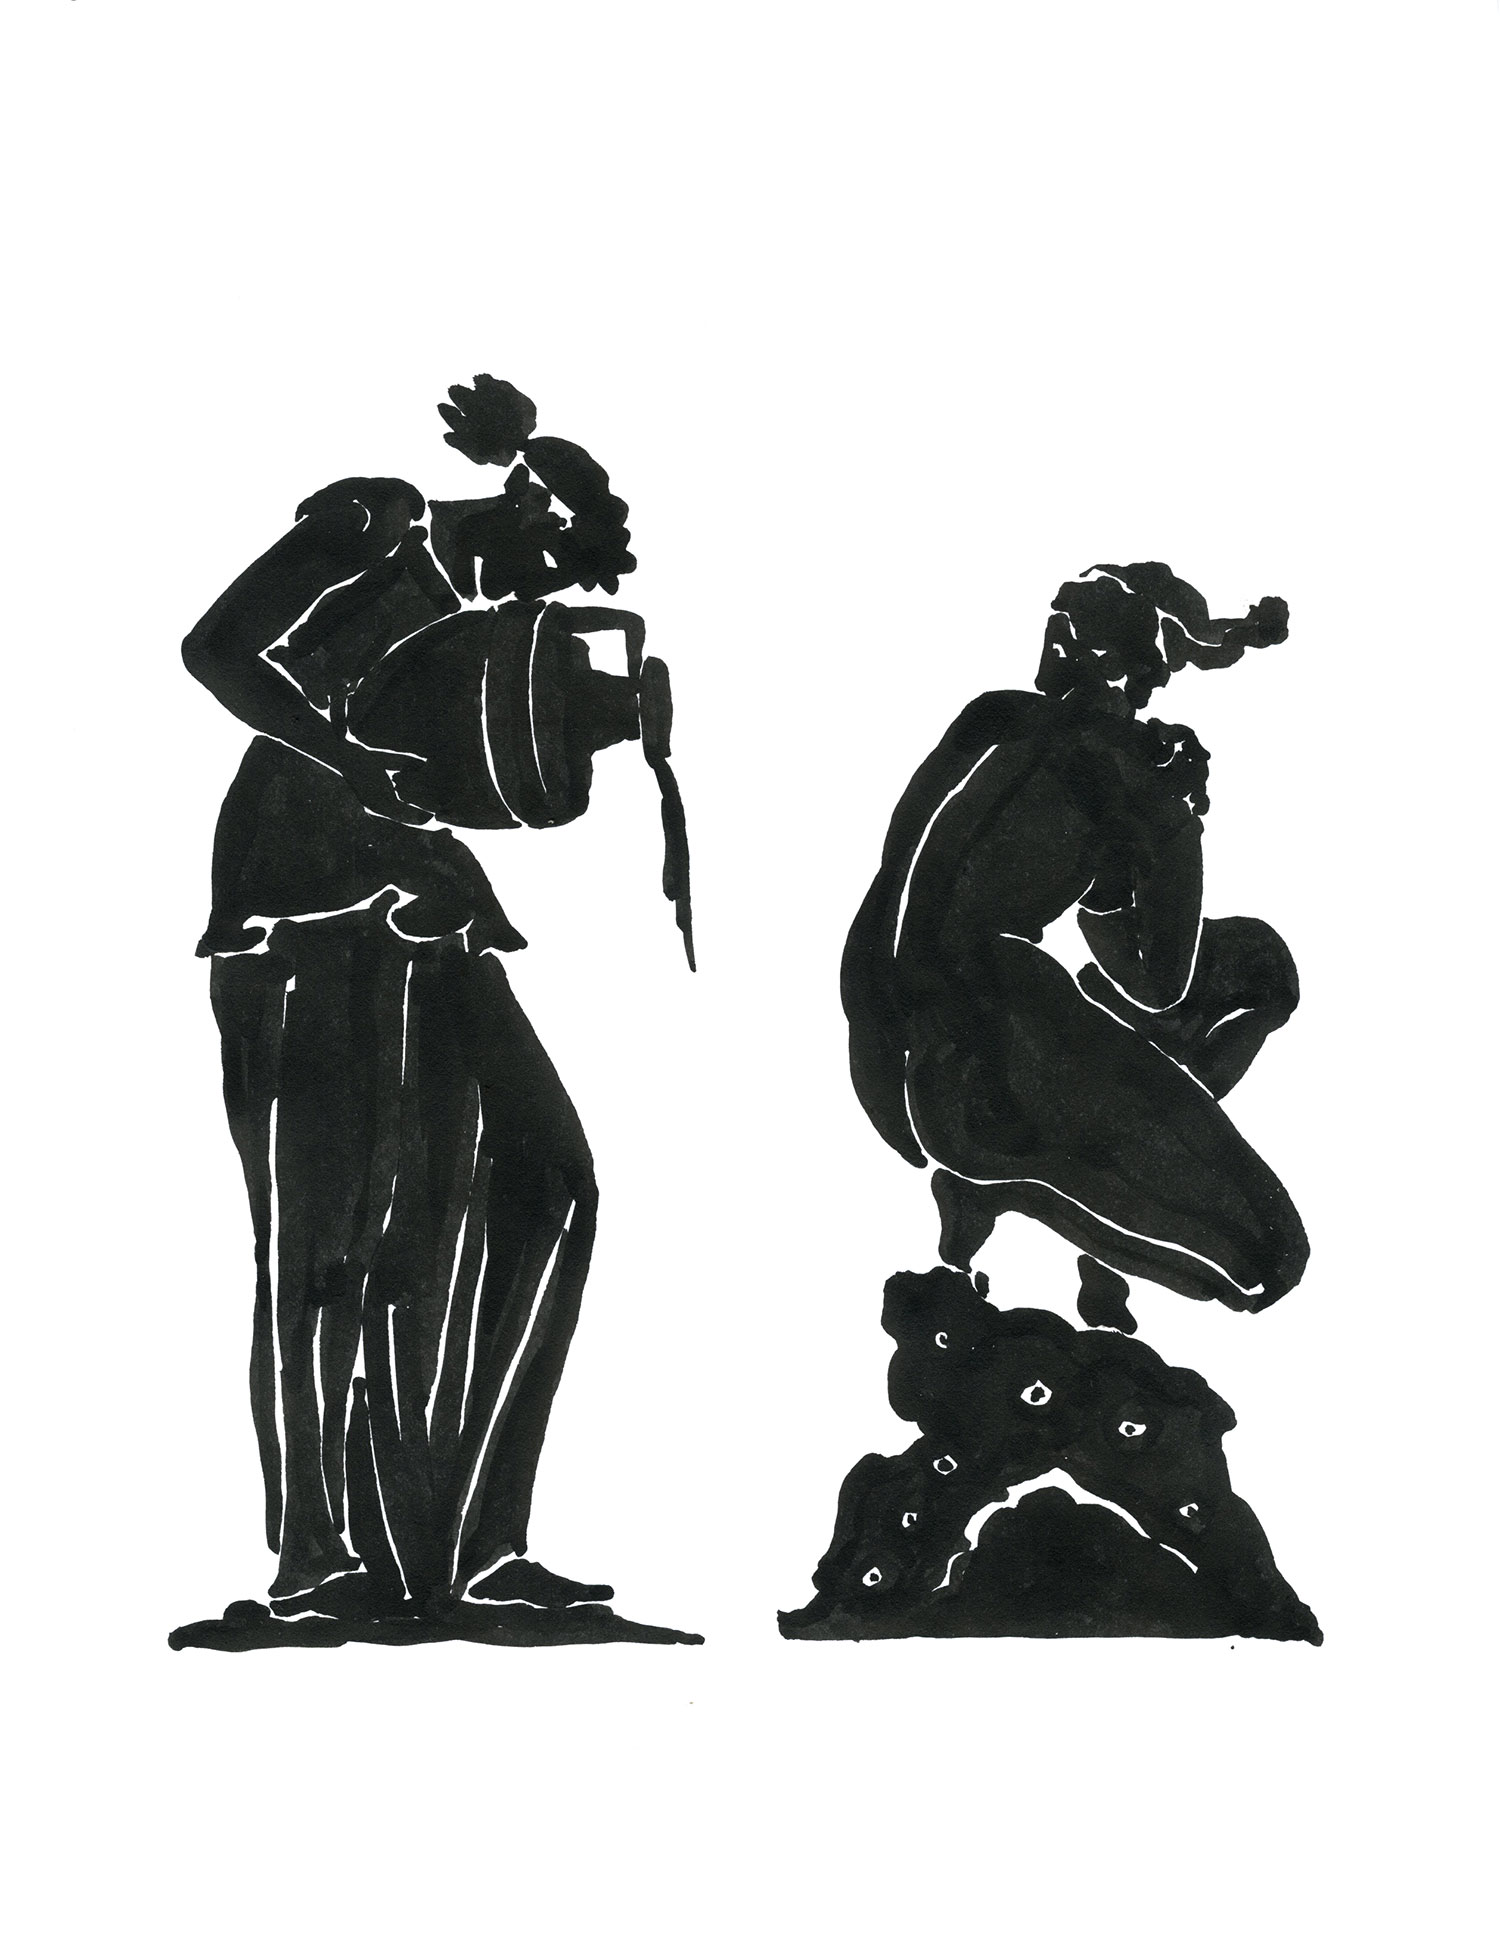 "Deepdene Bather (Black Figure)  2014, Ink on paper, 11"" x 8 1/2"" © Leonard Porter MMXIV"